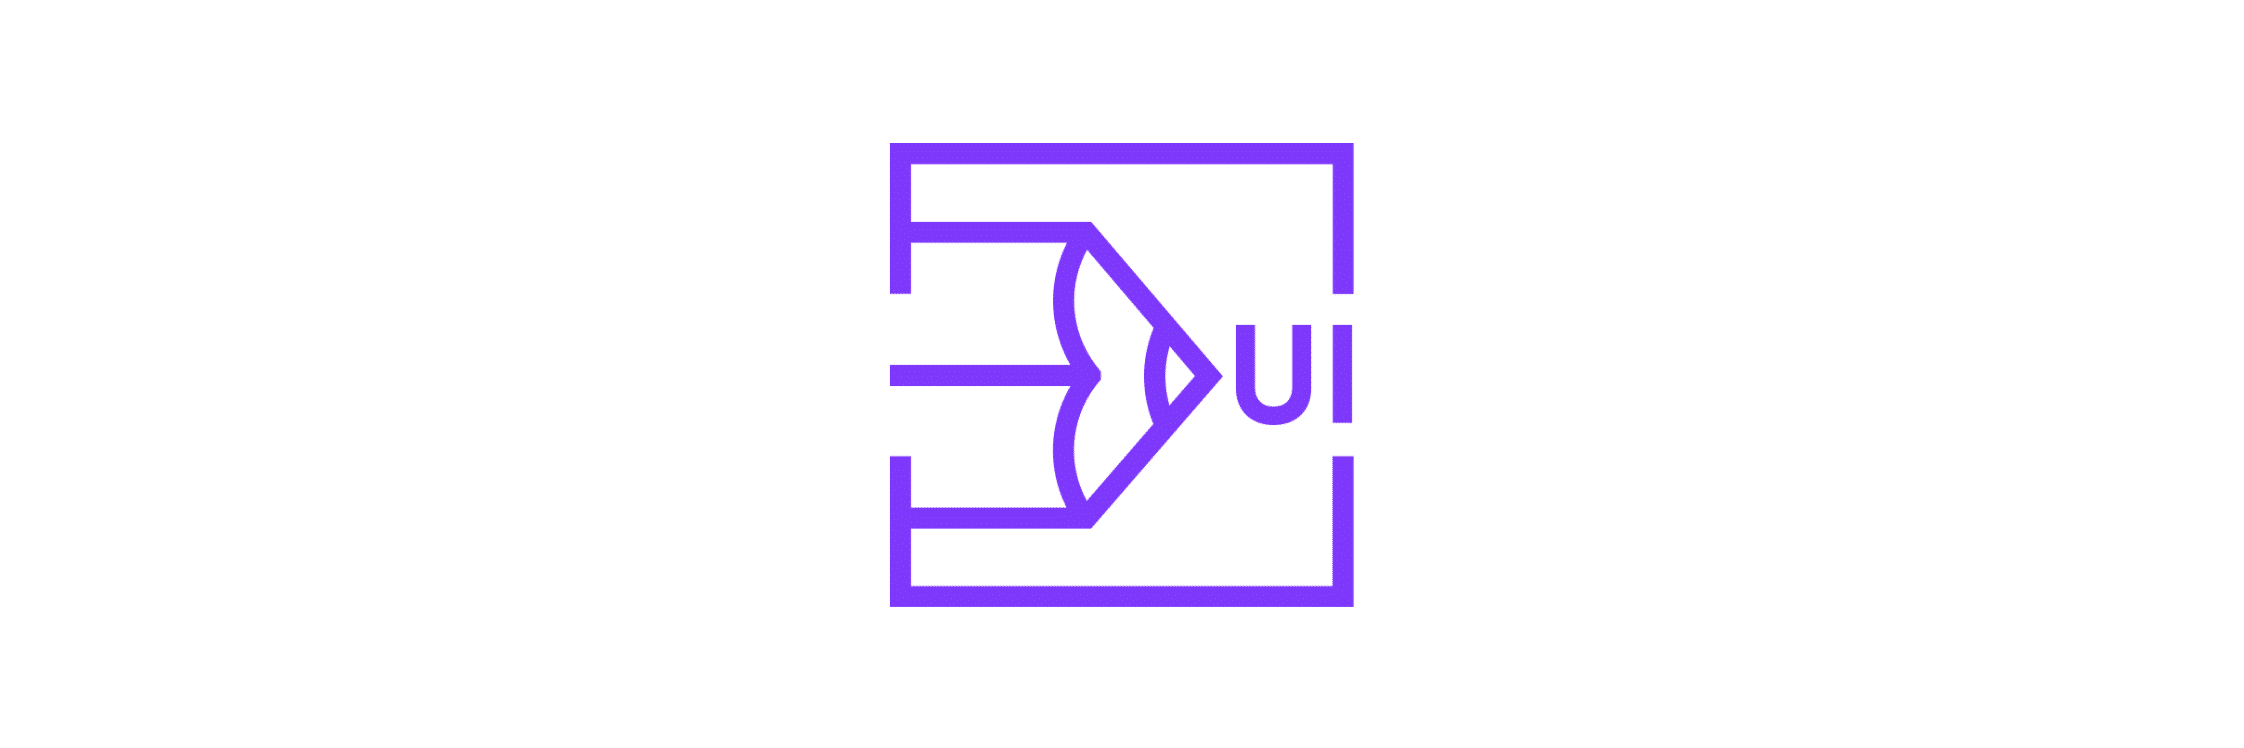 Mobile app development process. UI